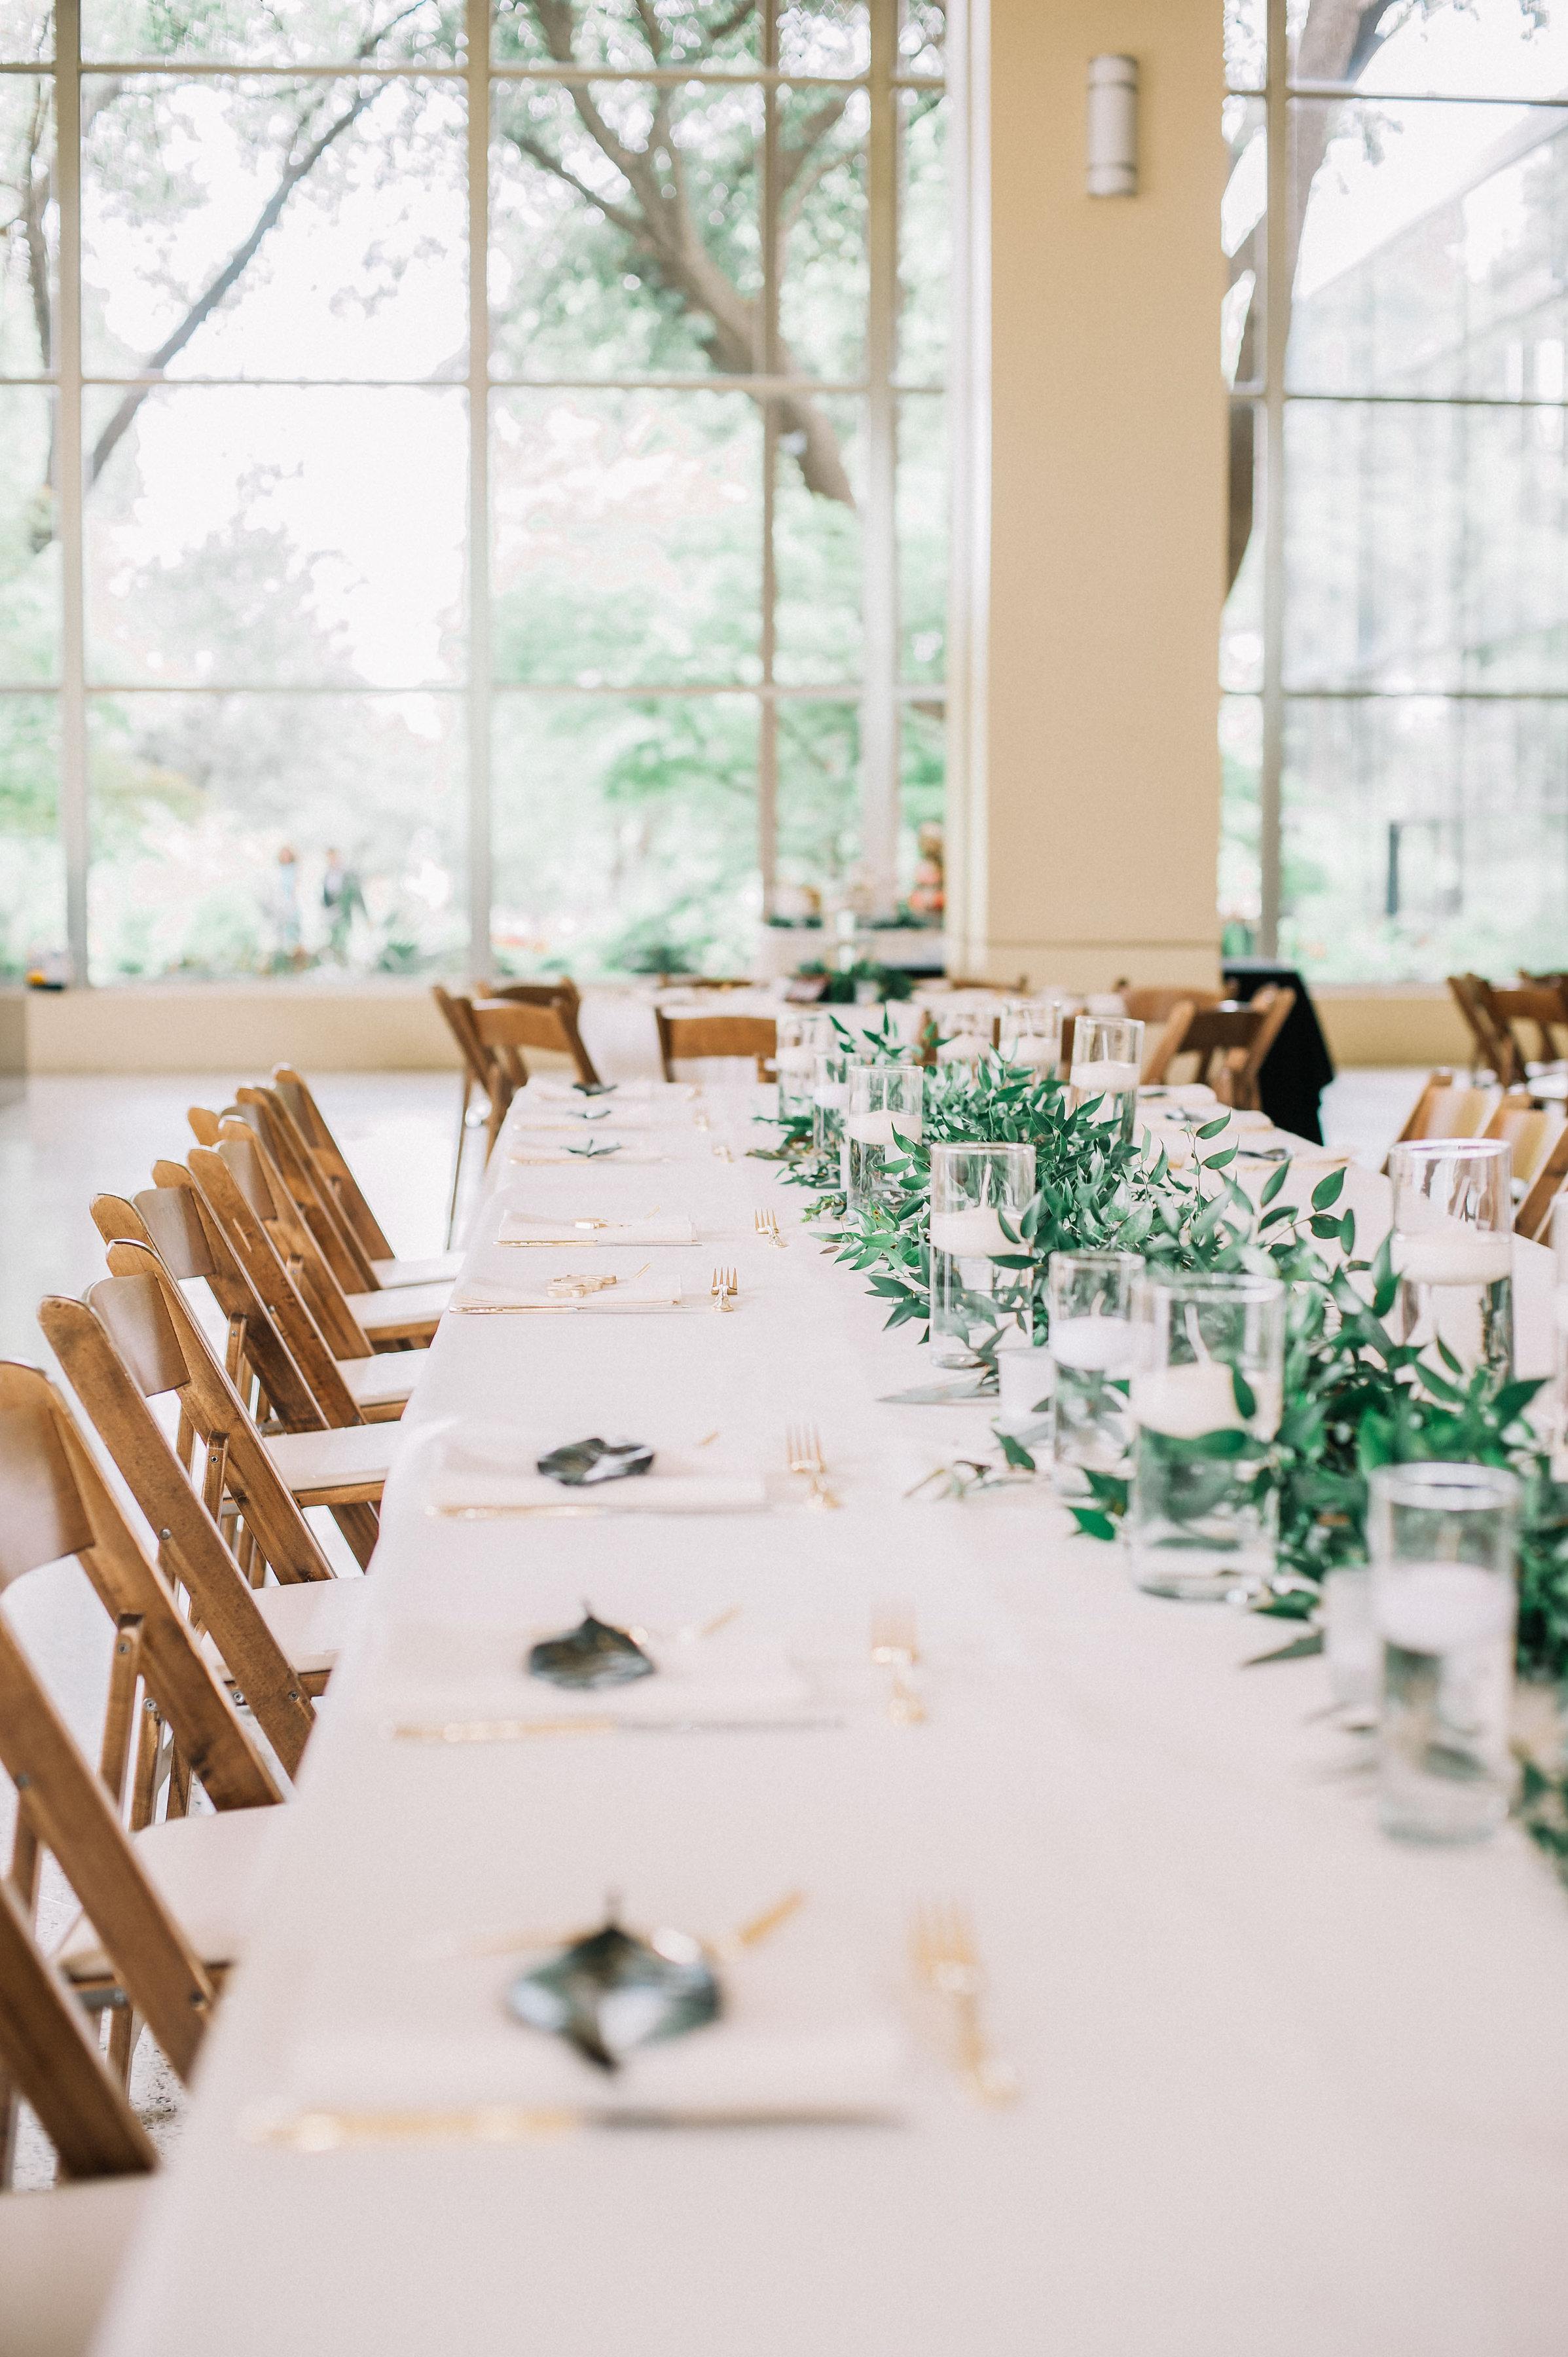 Dallas_Texas_Discovery_Gardens_Wedding_VanessaAlvin0430.jpg